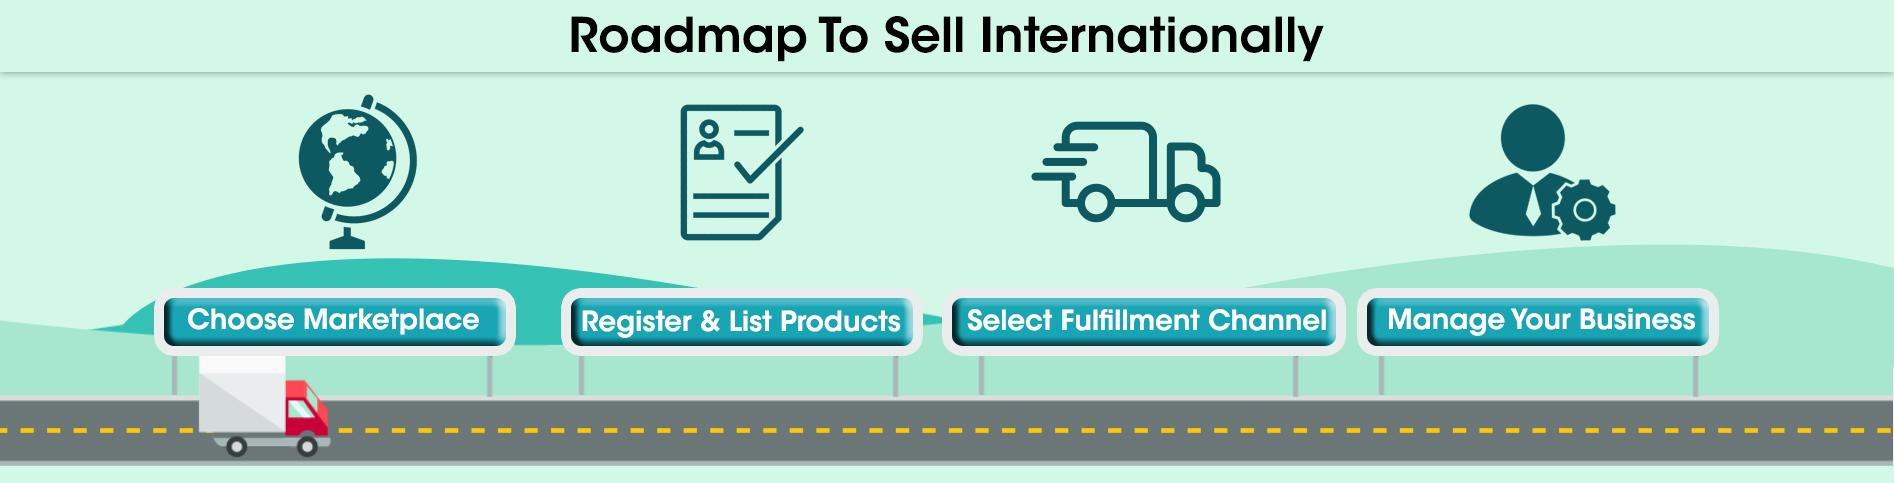 Roadmap to Sell Internationally